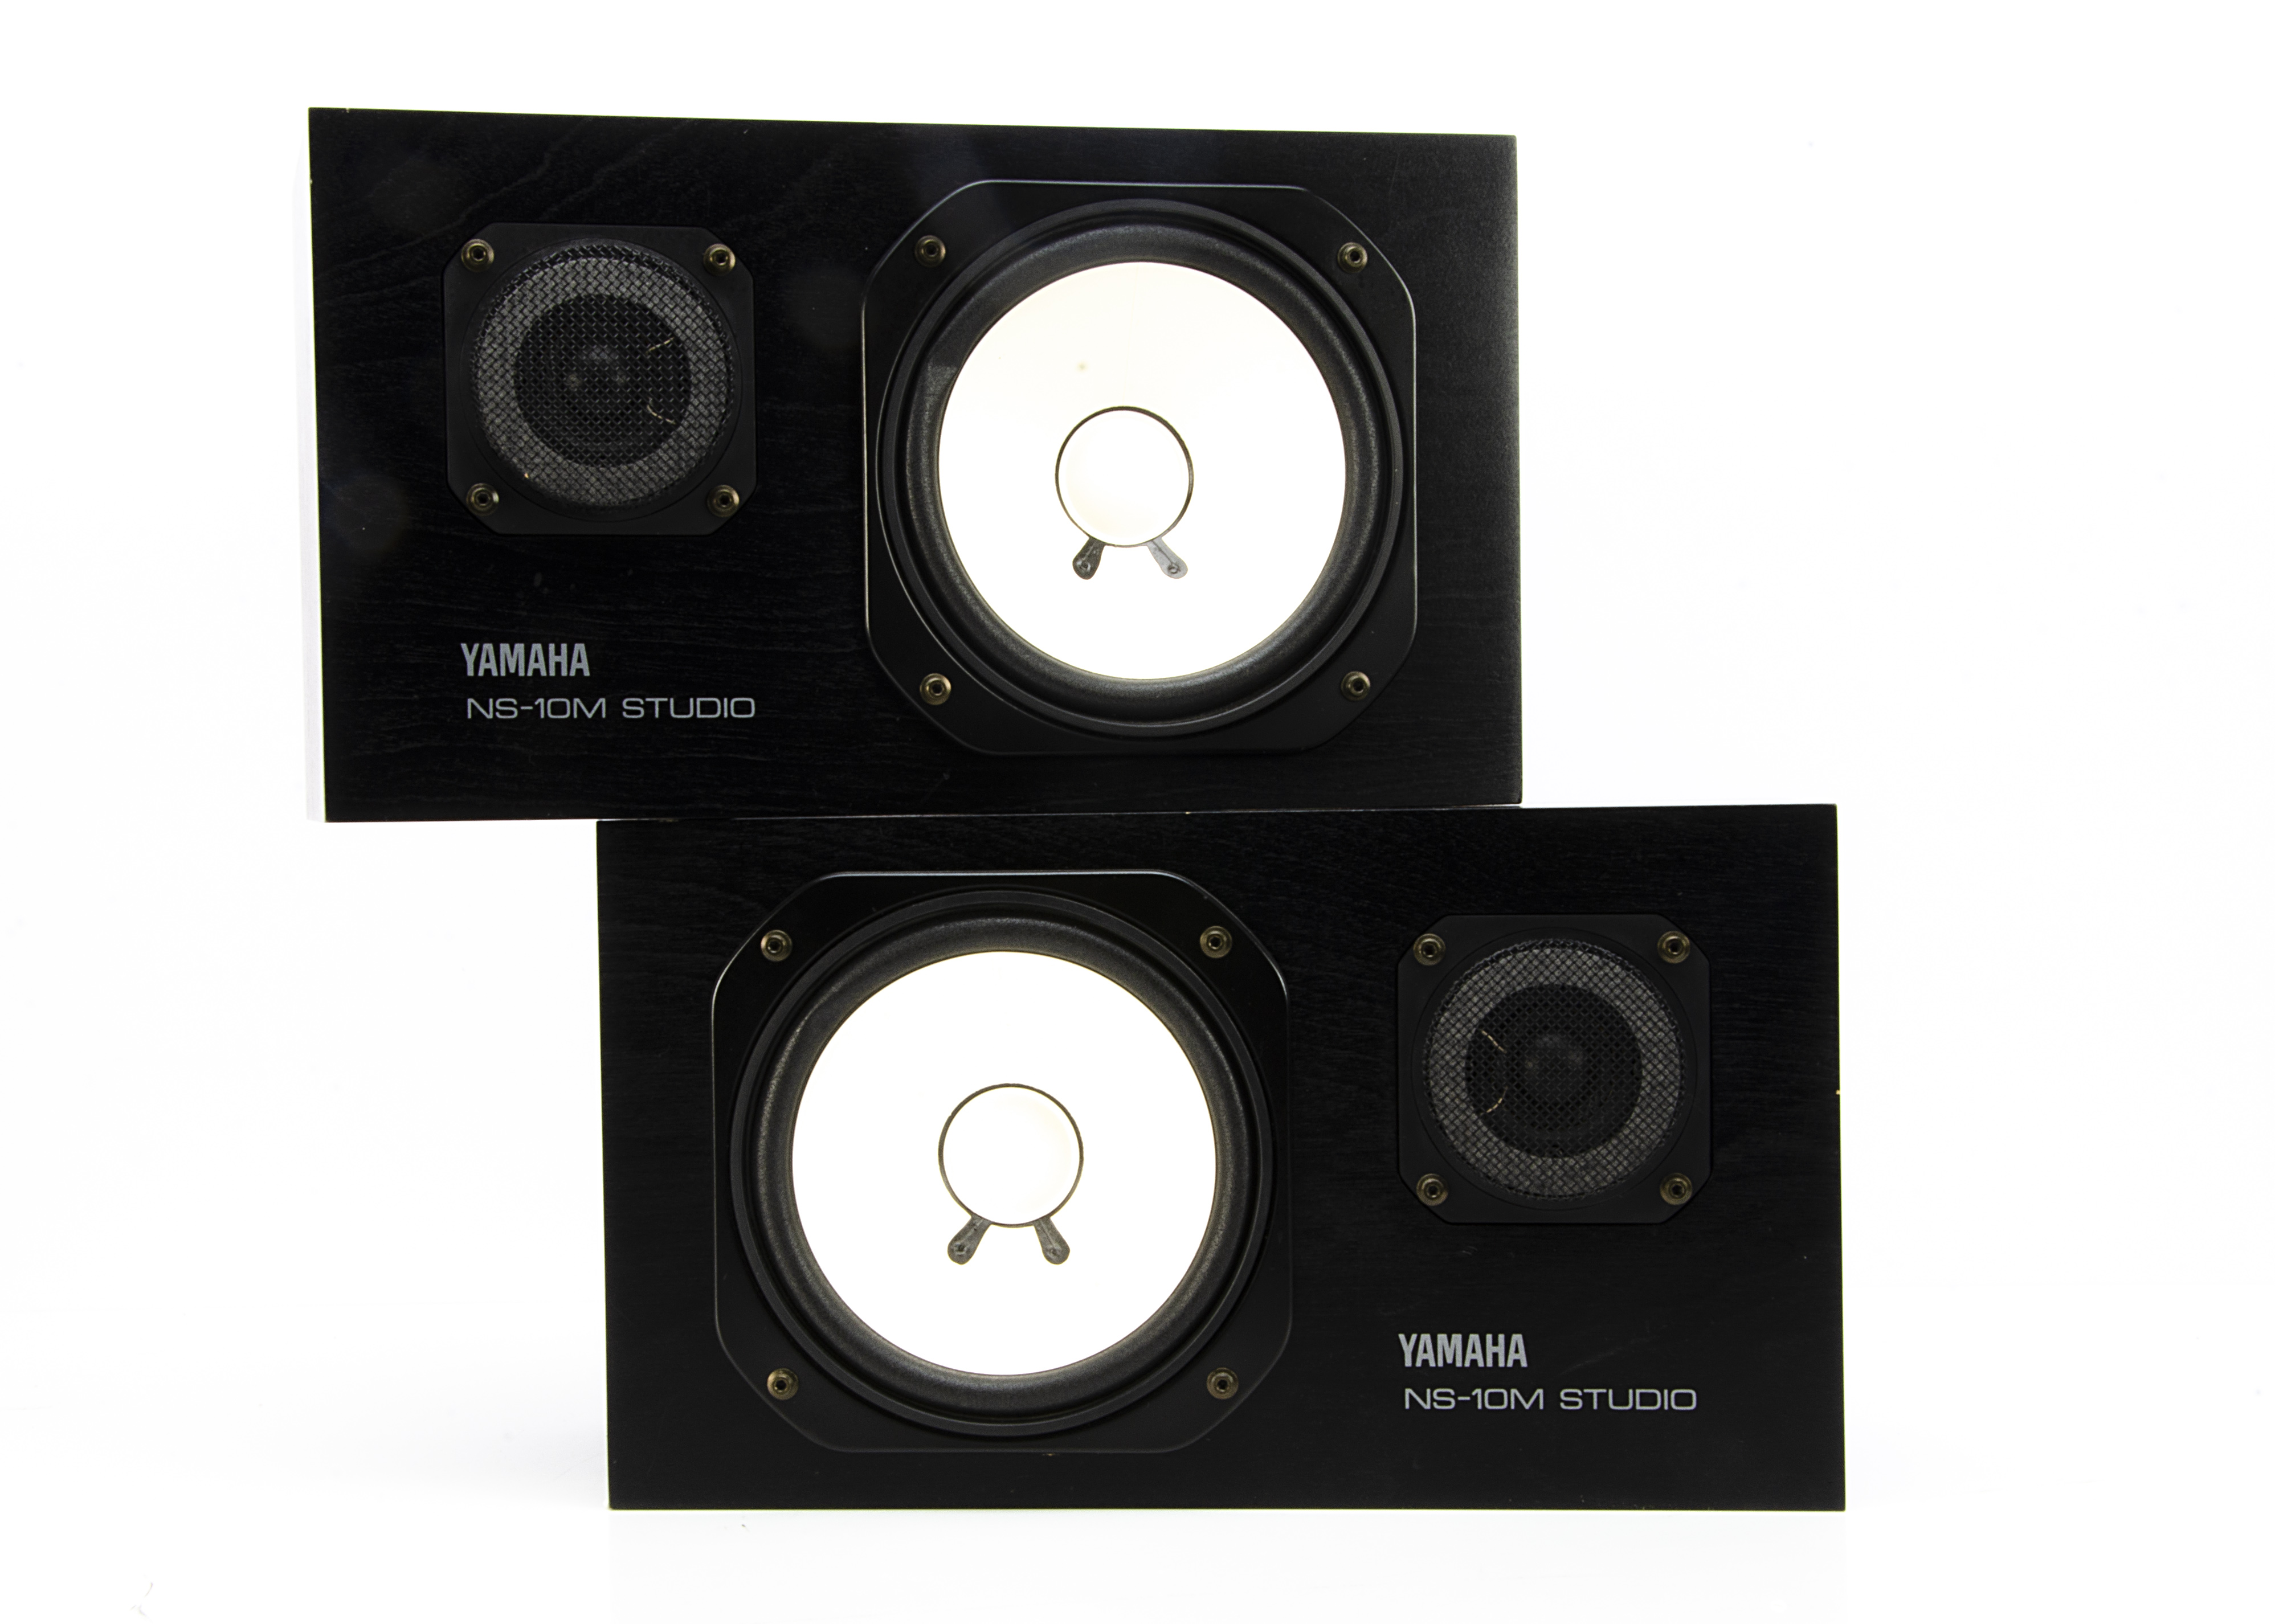 Yamaha Studio Monitors, a pair of Yamaha Studio Monitors model NS-10m matched, with instruction